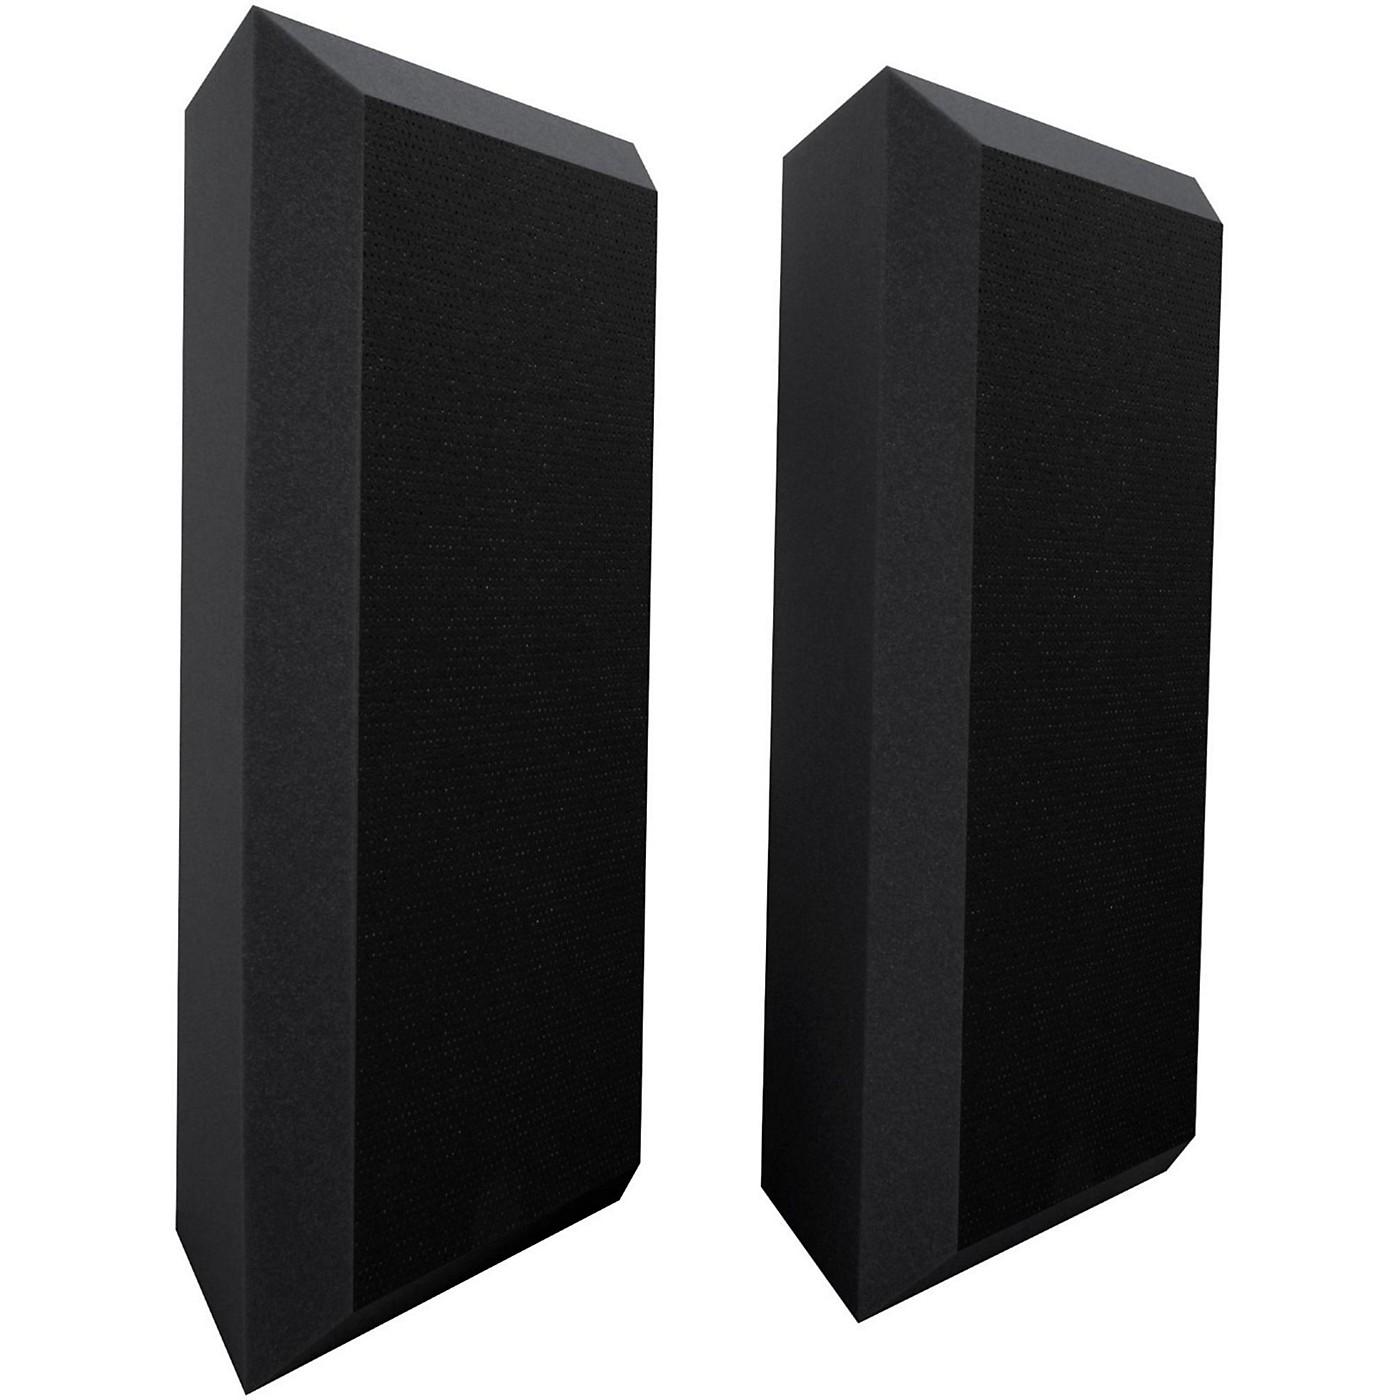 Ultimate Acoustics Acoustic Bass Trap with Vinyl Coating - Bevel (UA-BTBV) 2-Pack thumbnail